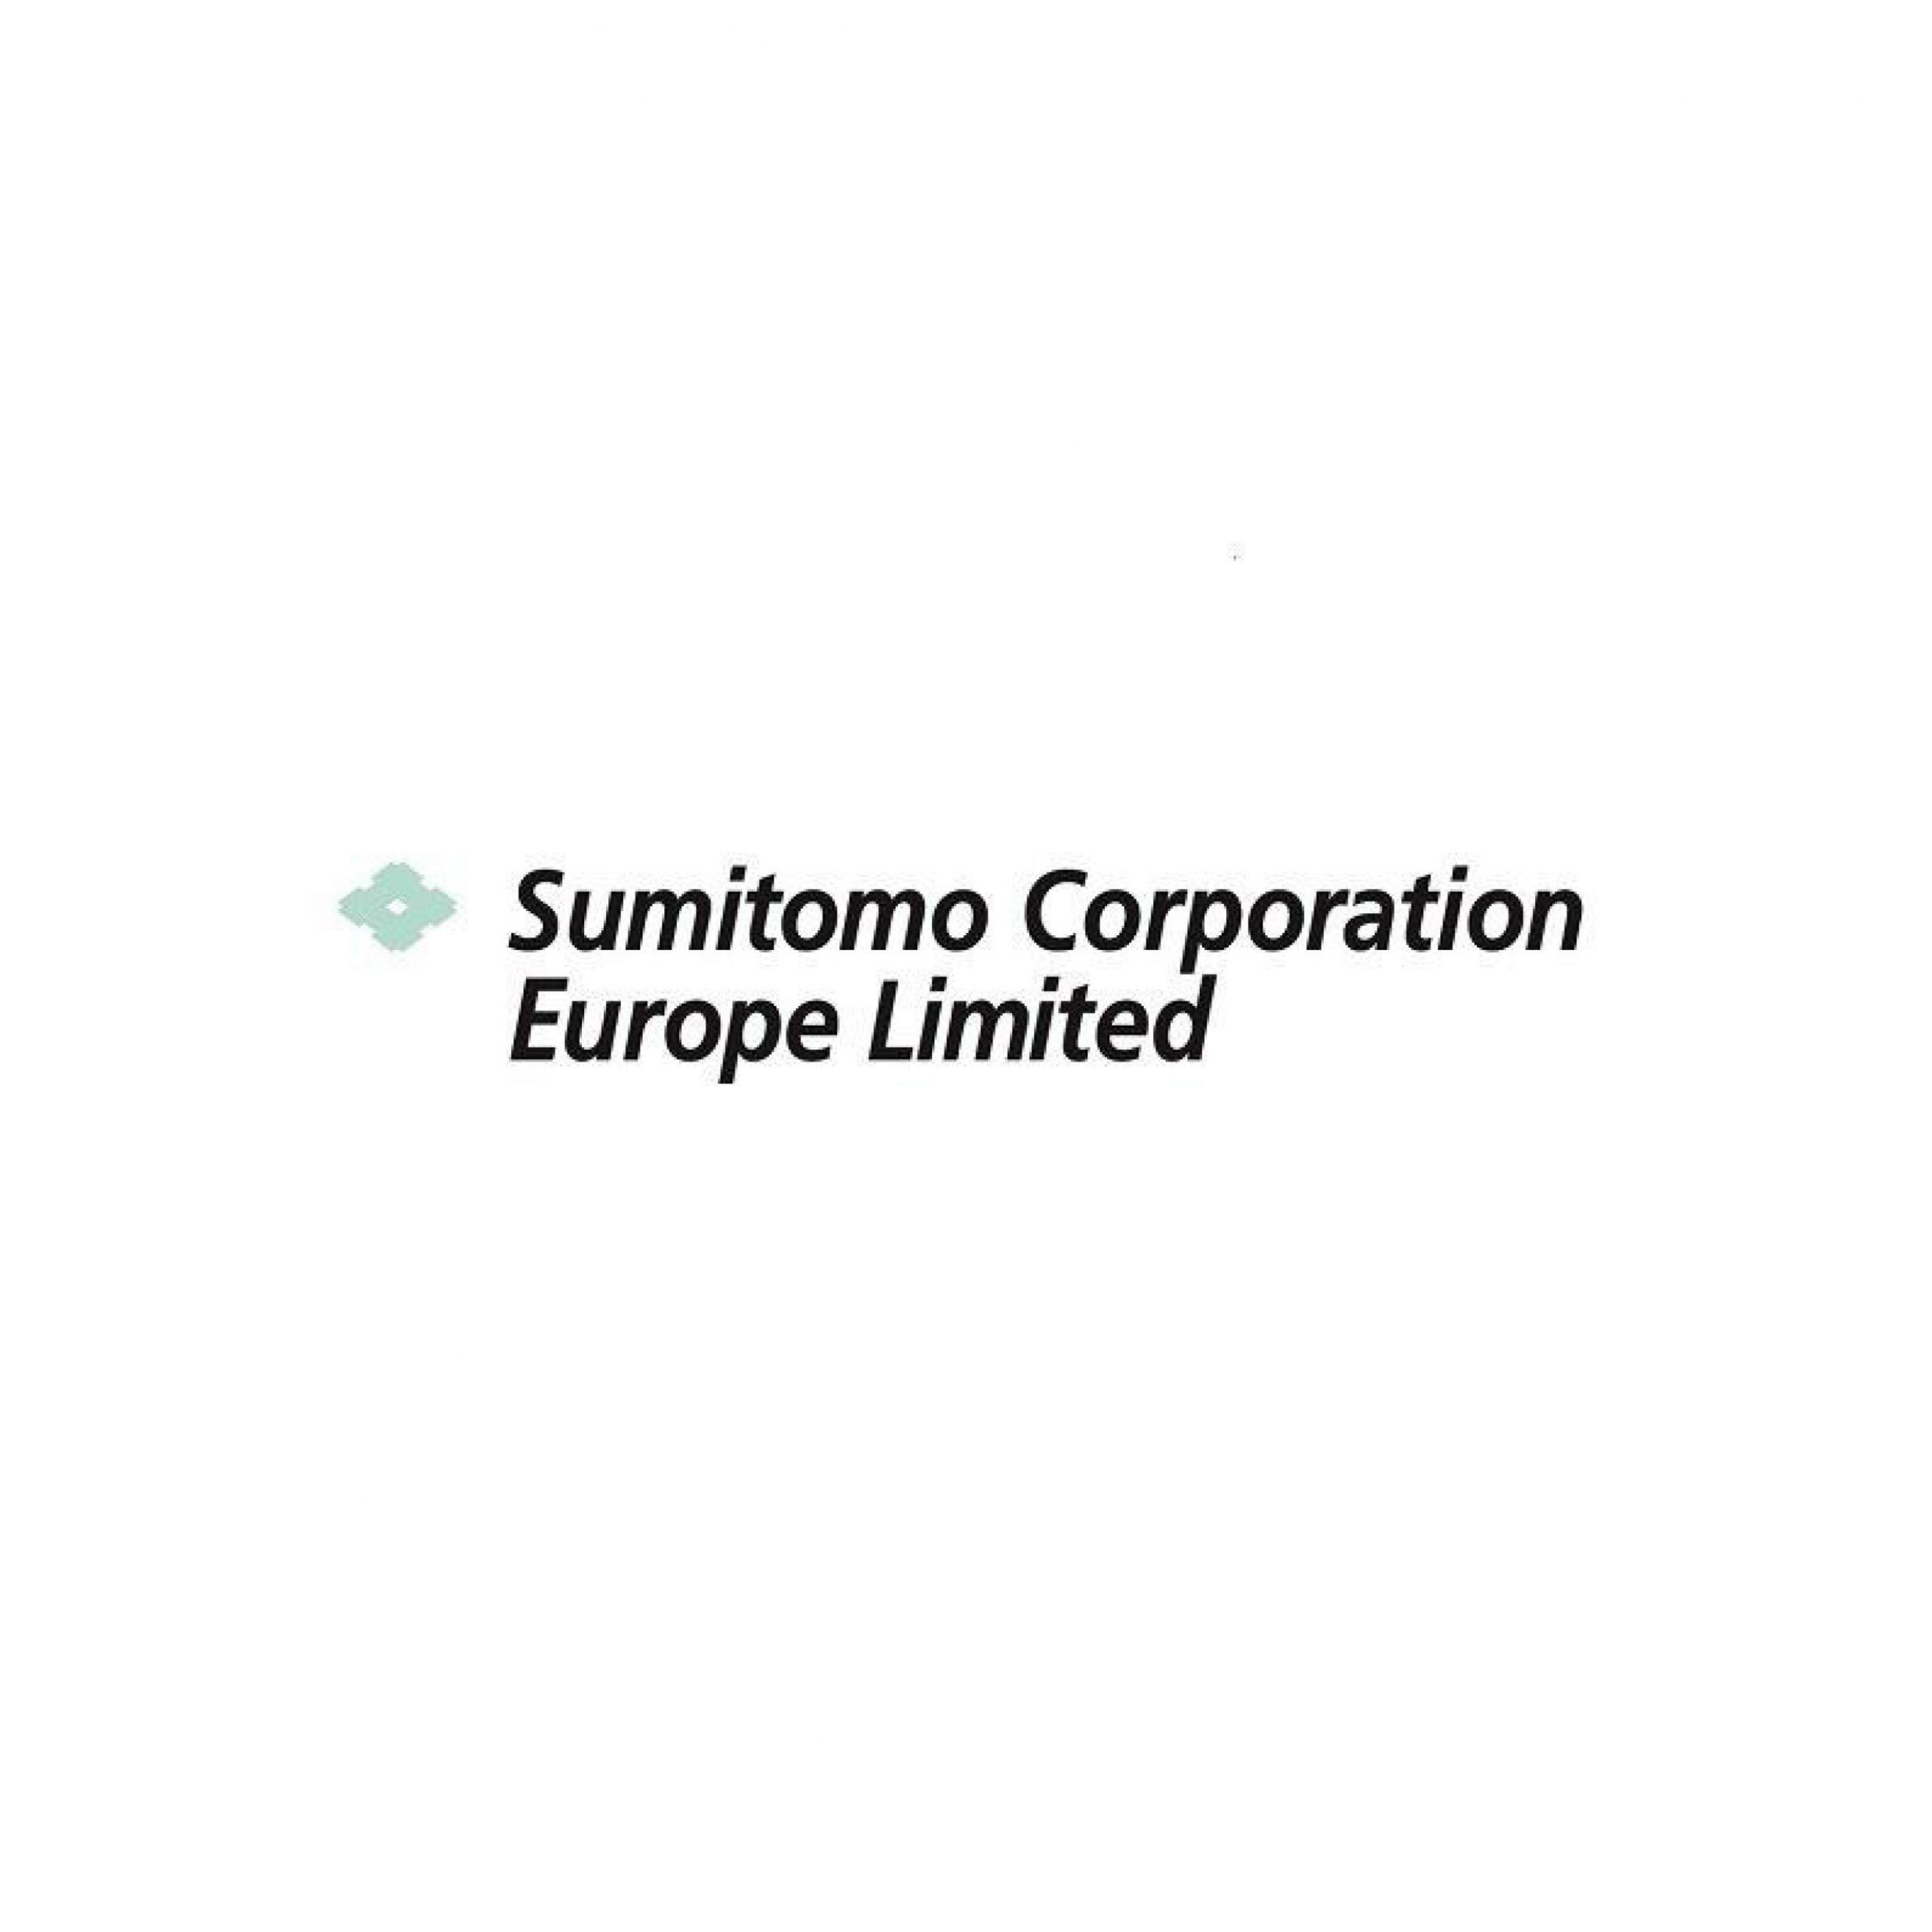 Sumitomo Corporation Europe Limited